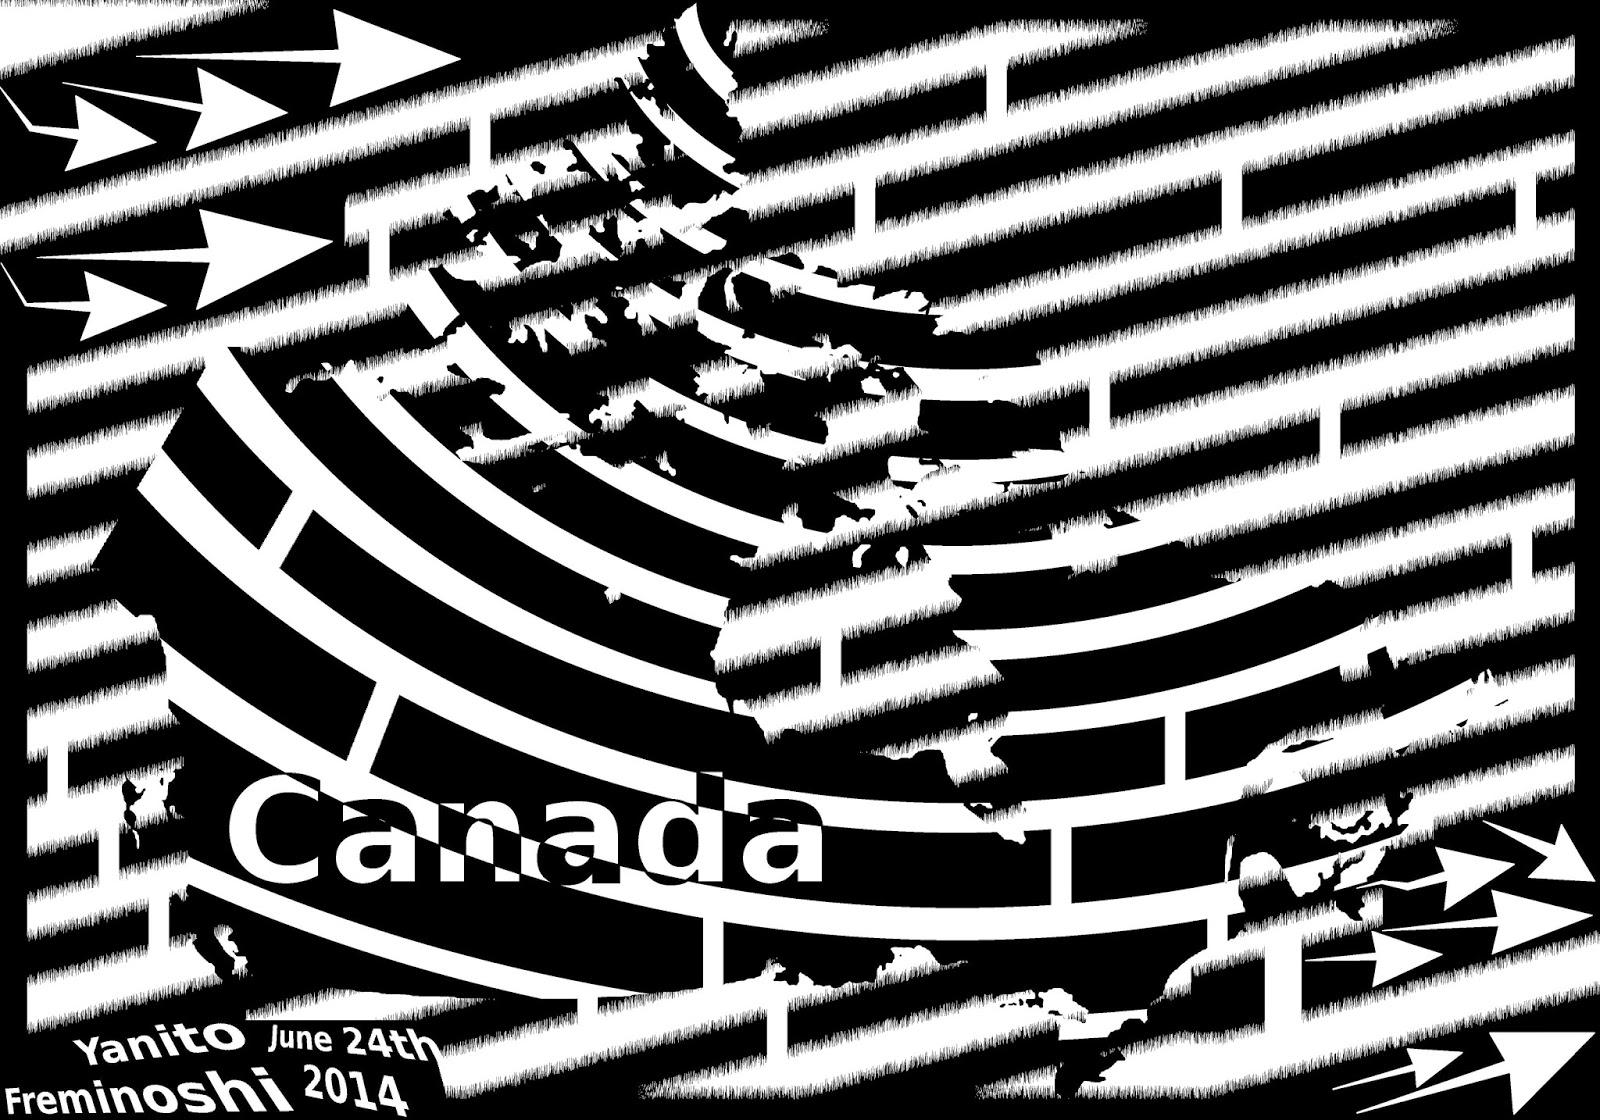 Maze of Canada